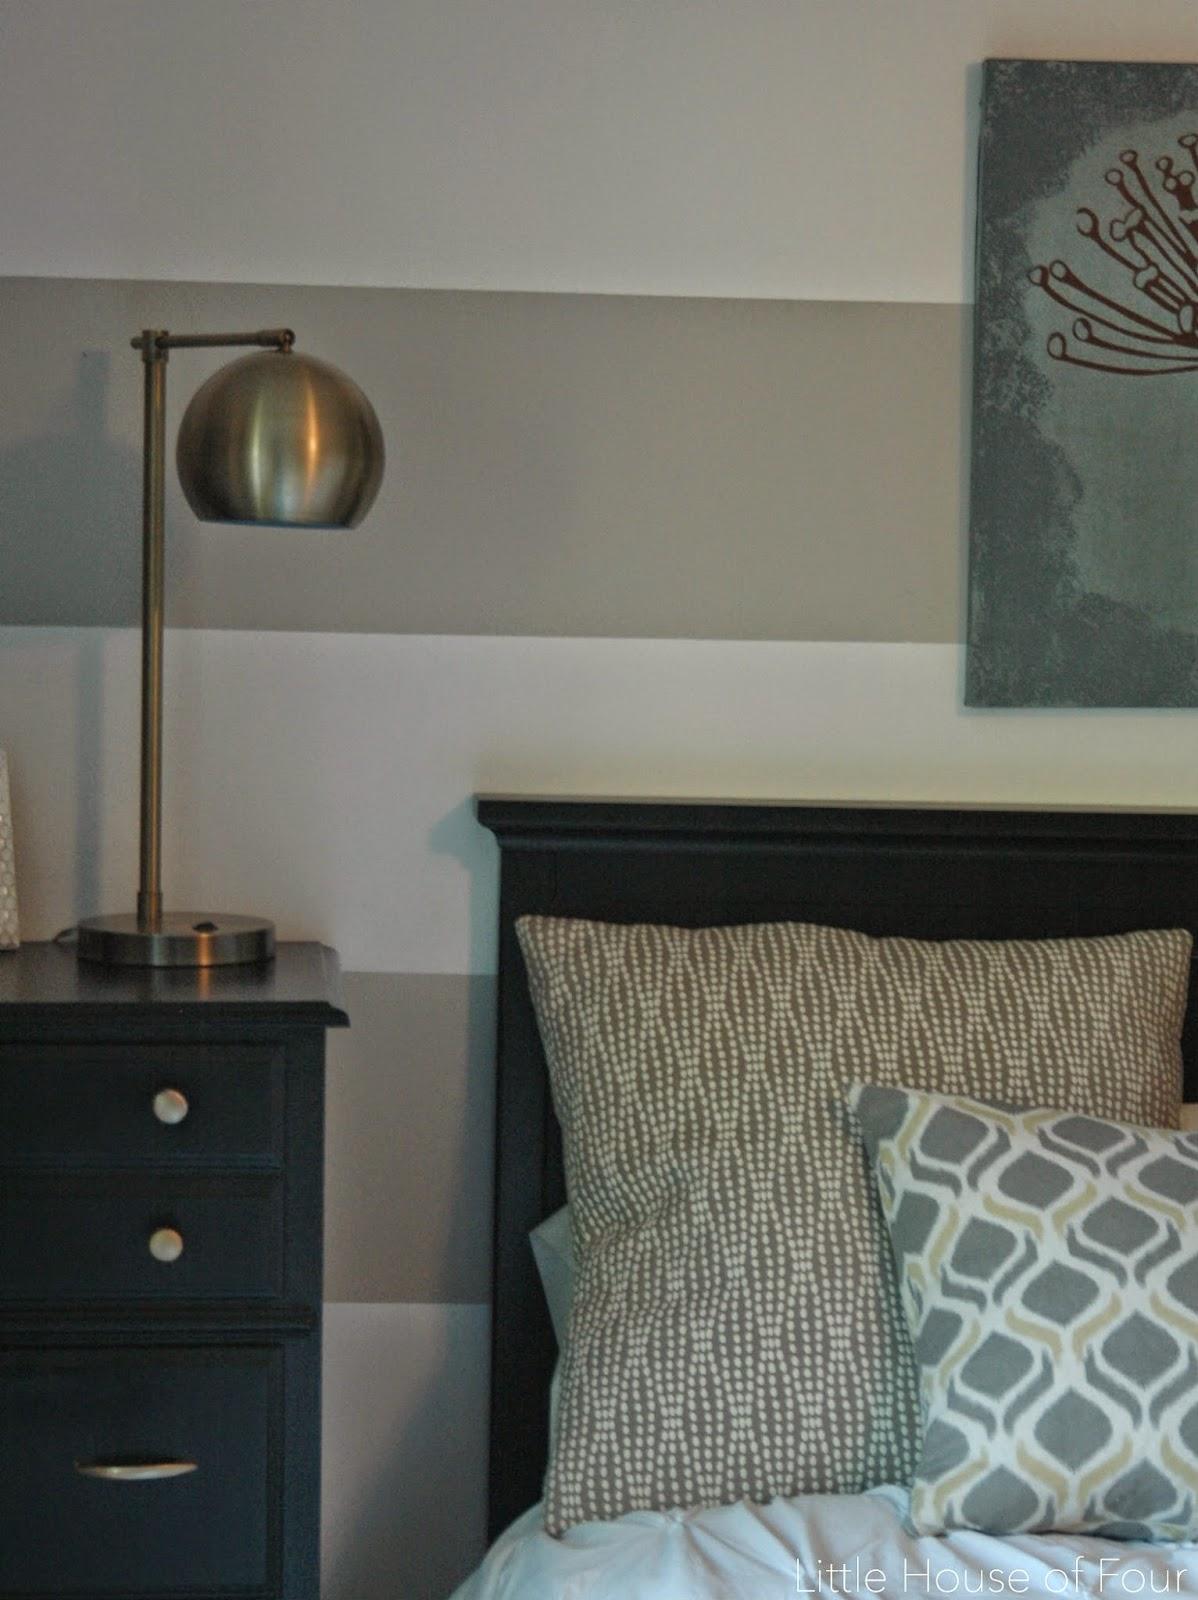 Target Living Room Furniture: Threshold Line At Target, Living Room And Bedroom Updates